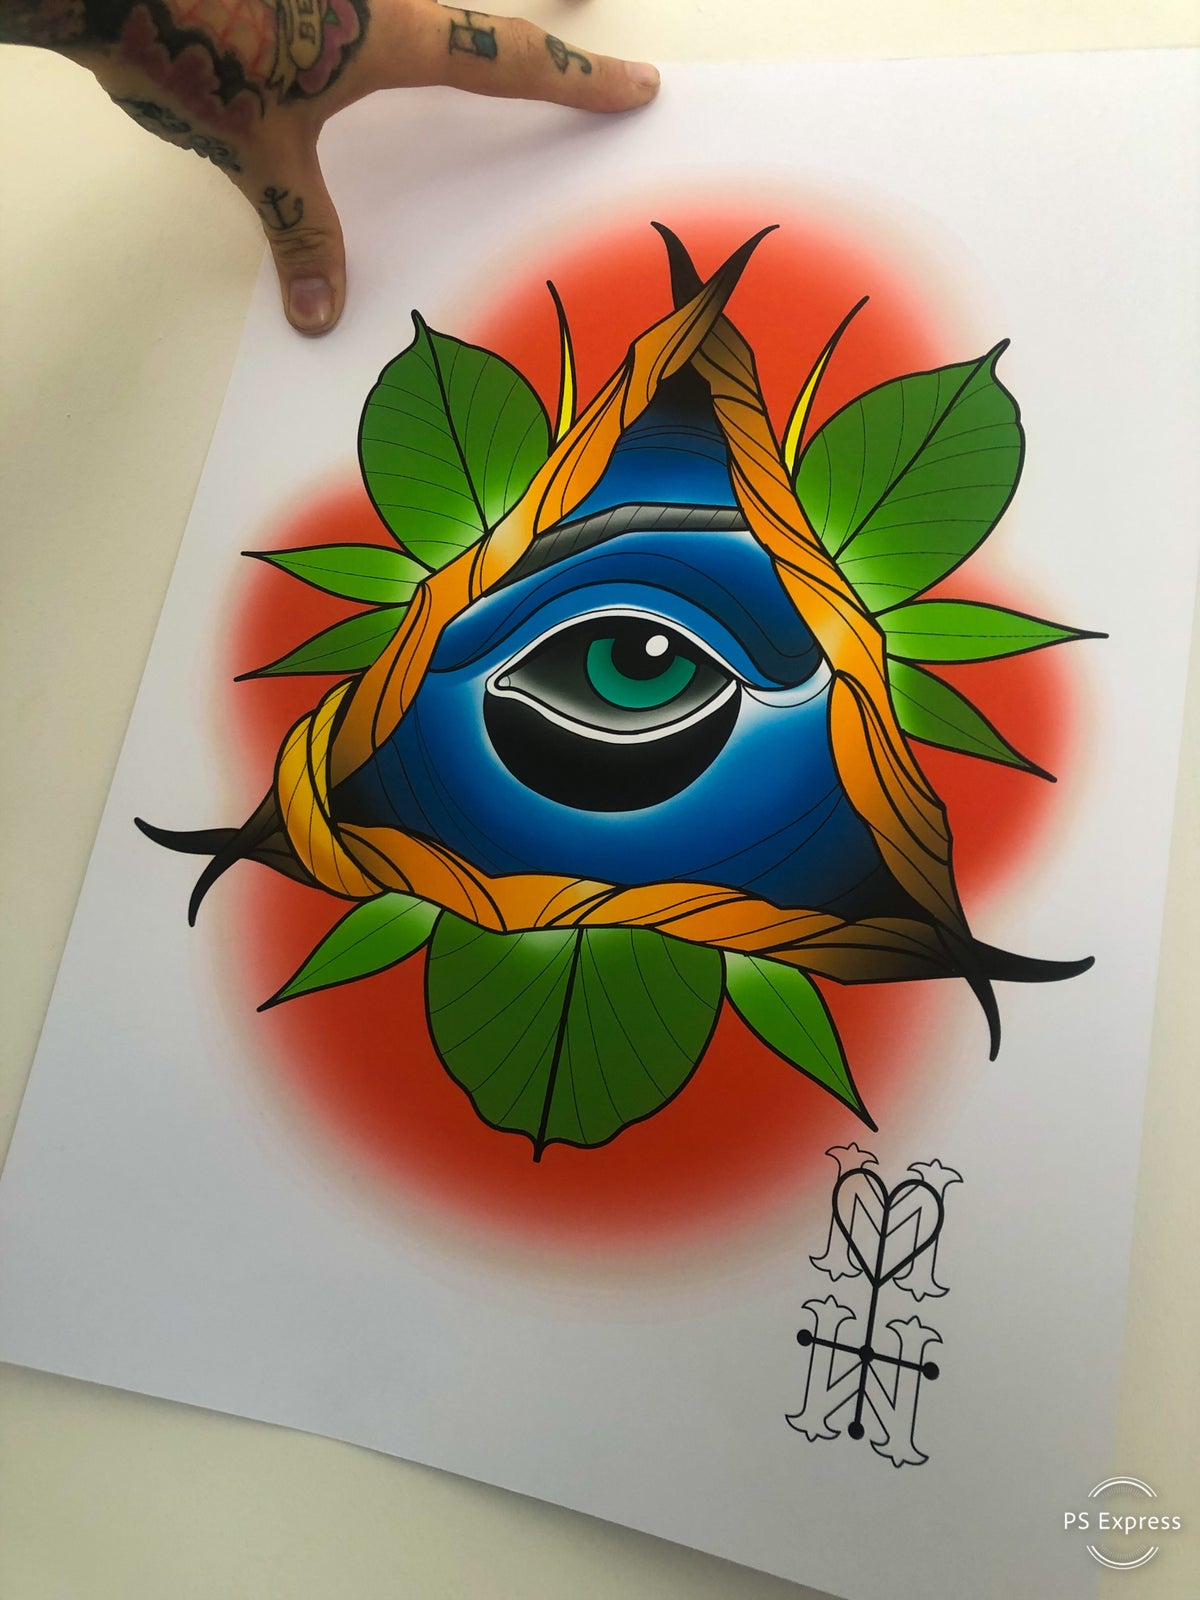 All Seeing Eye Print